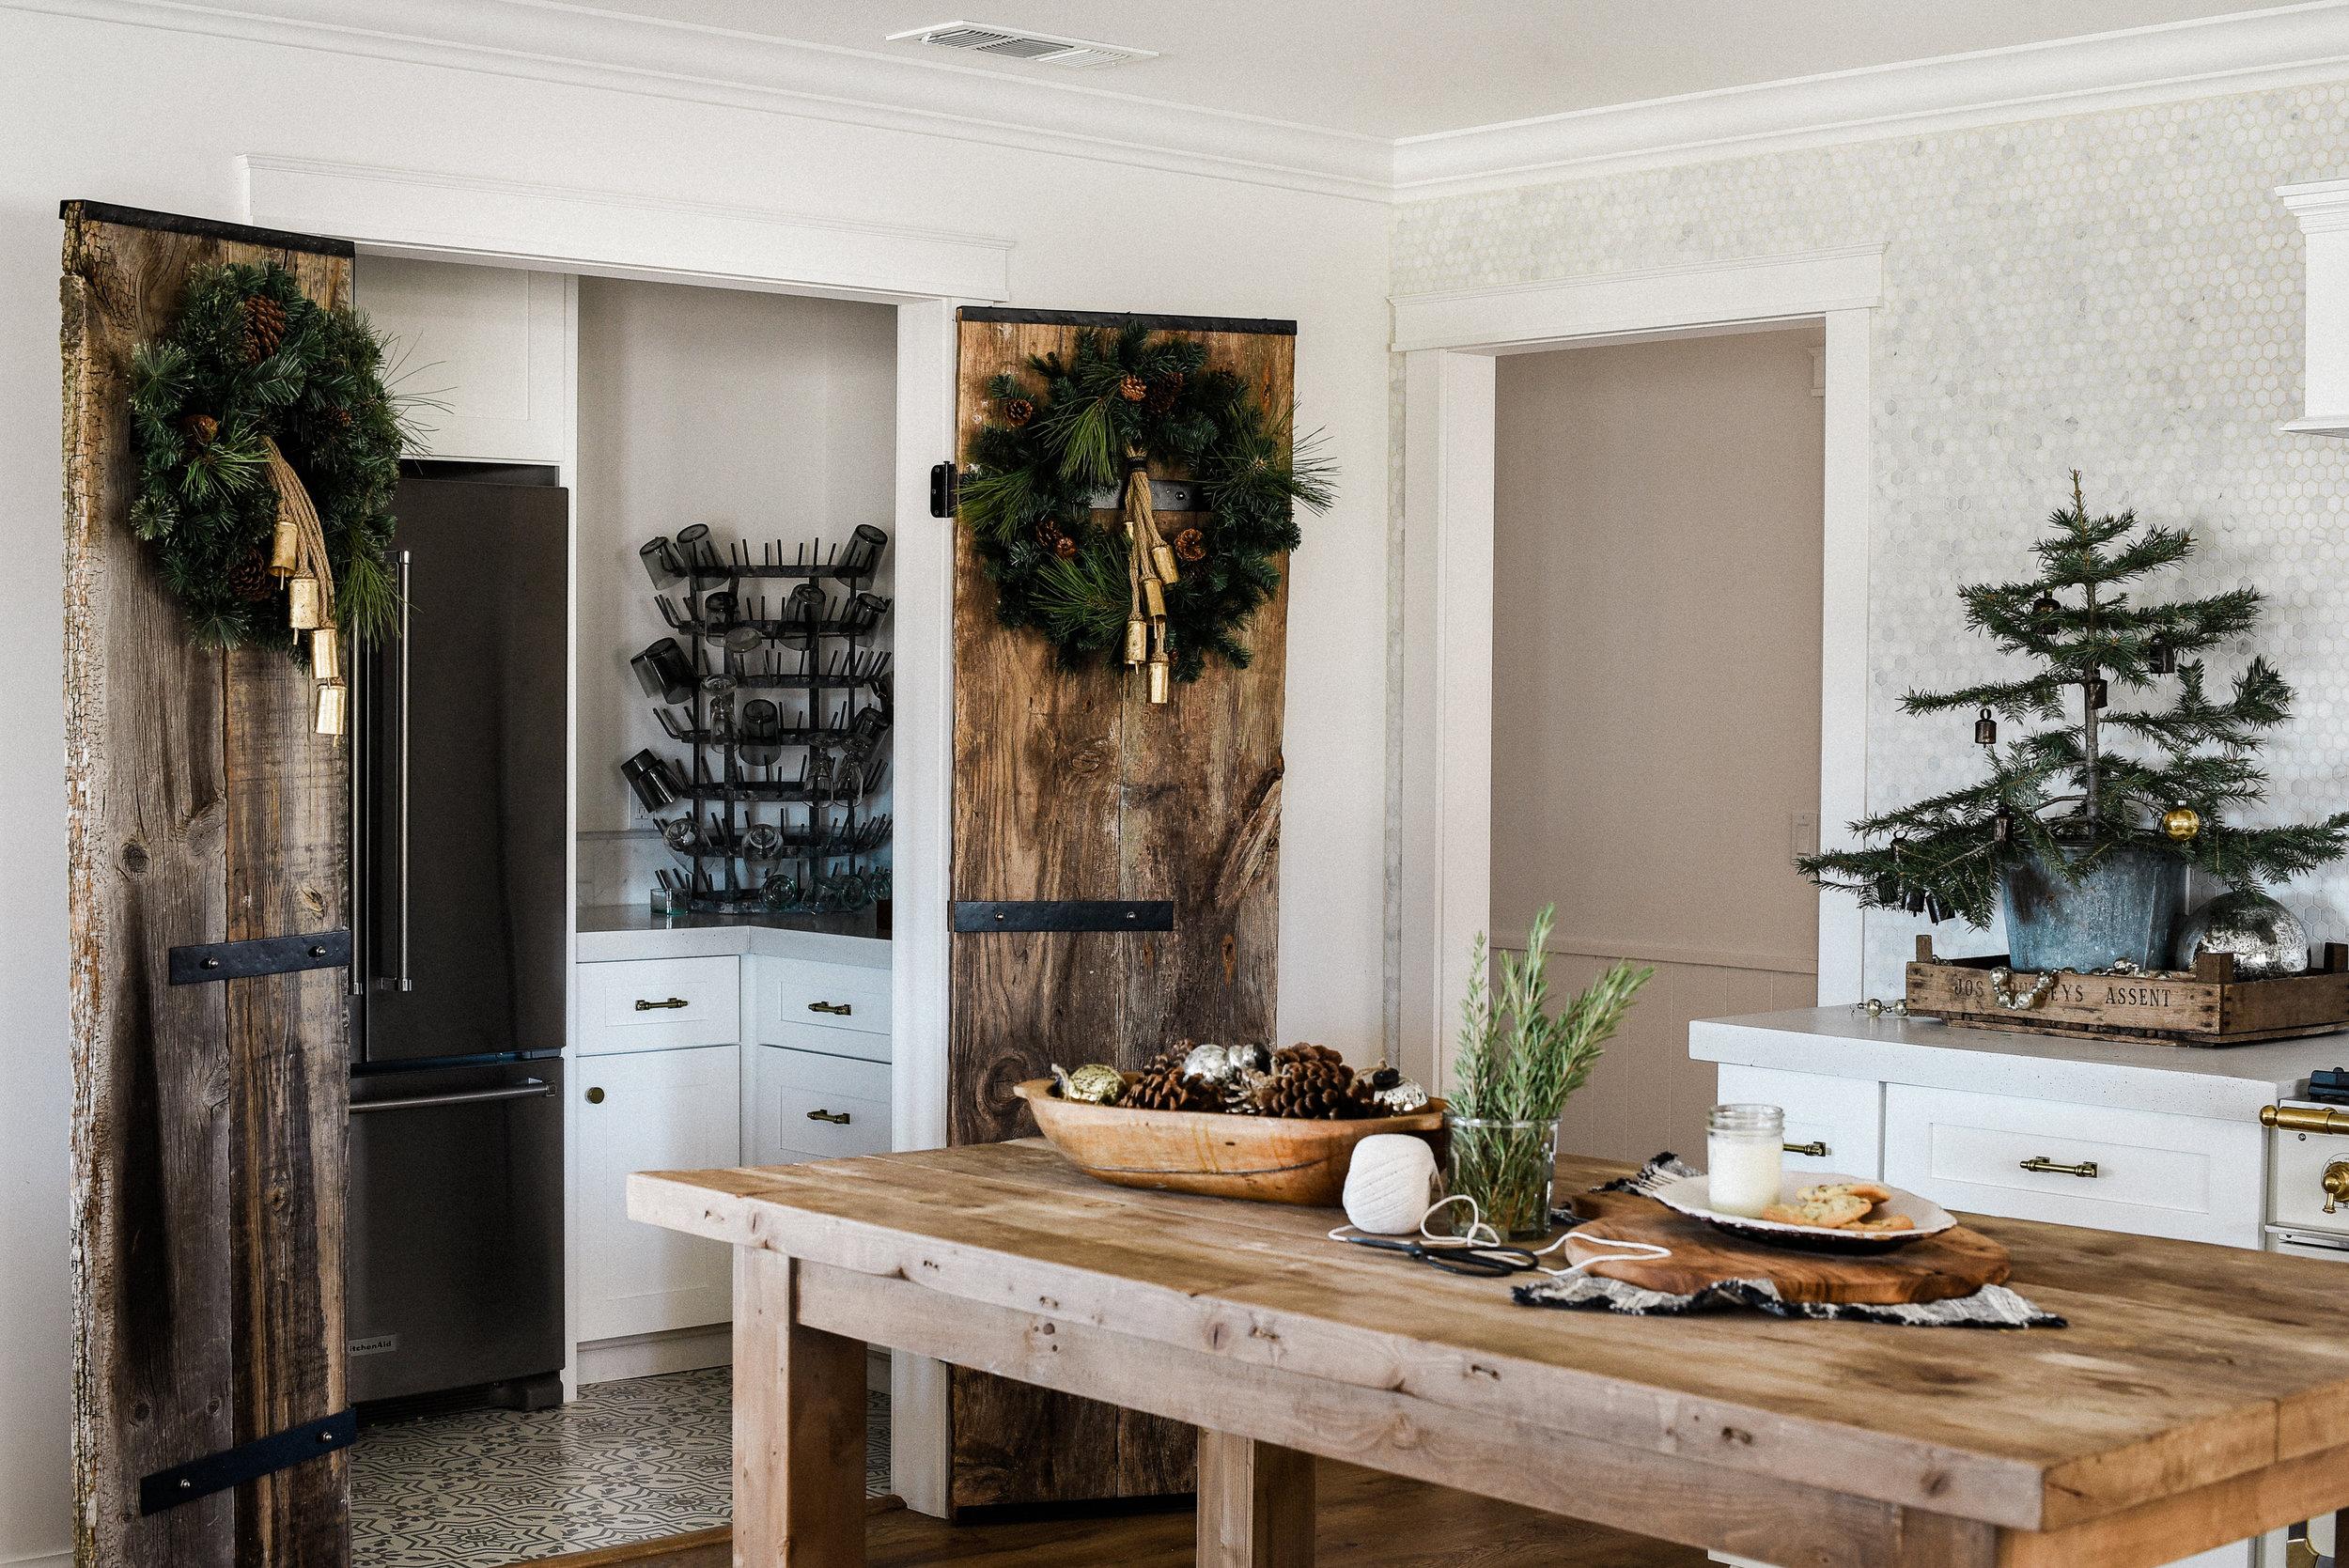 Christmas Kitchen decor from boxwoodavenue.com